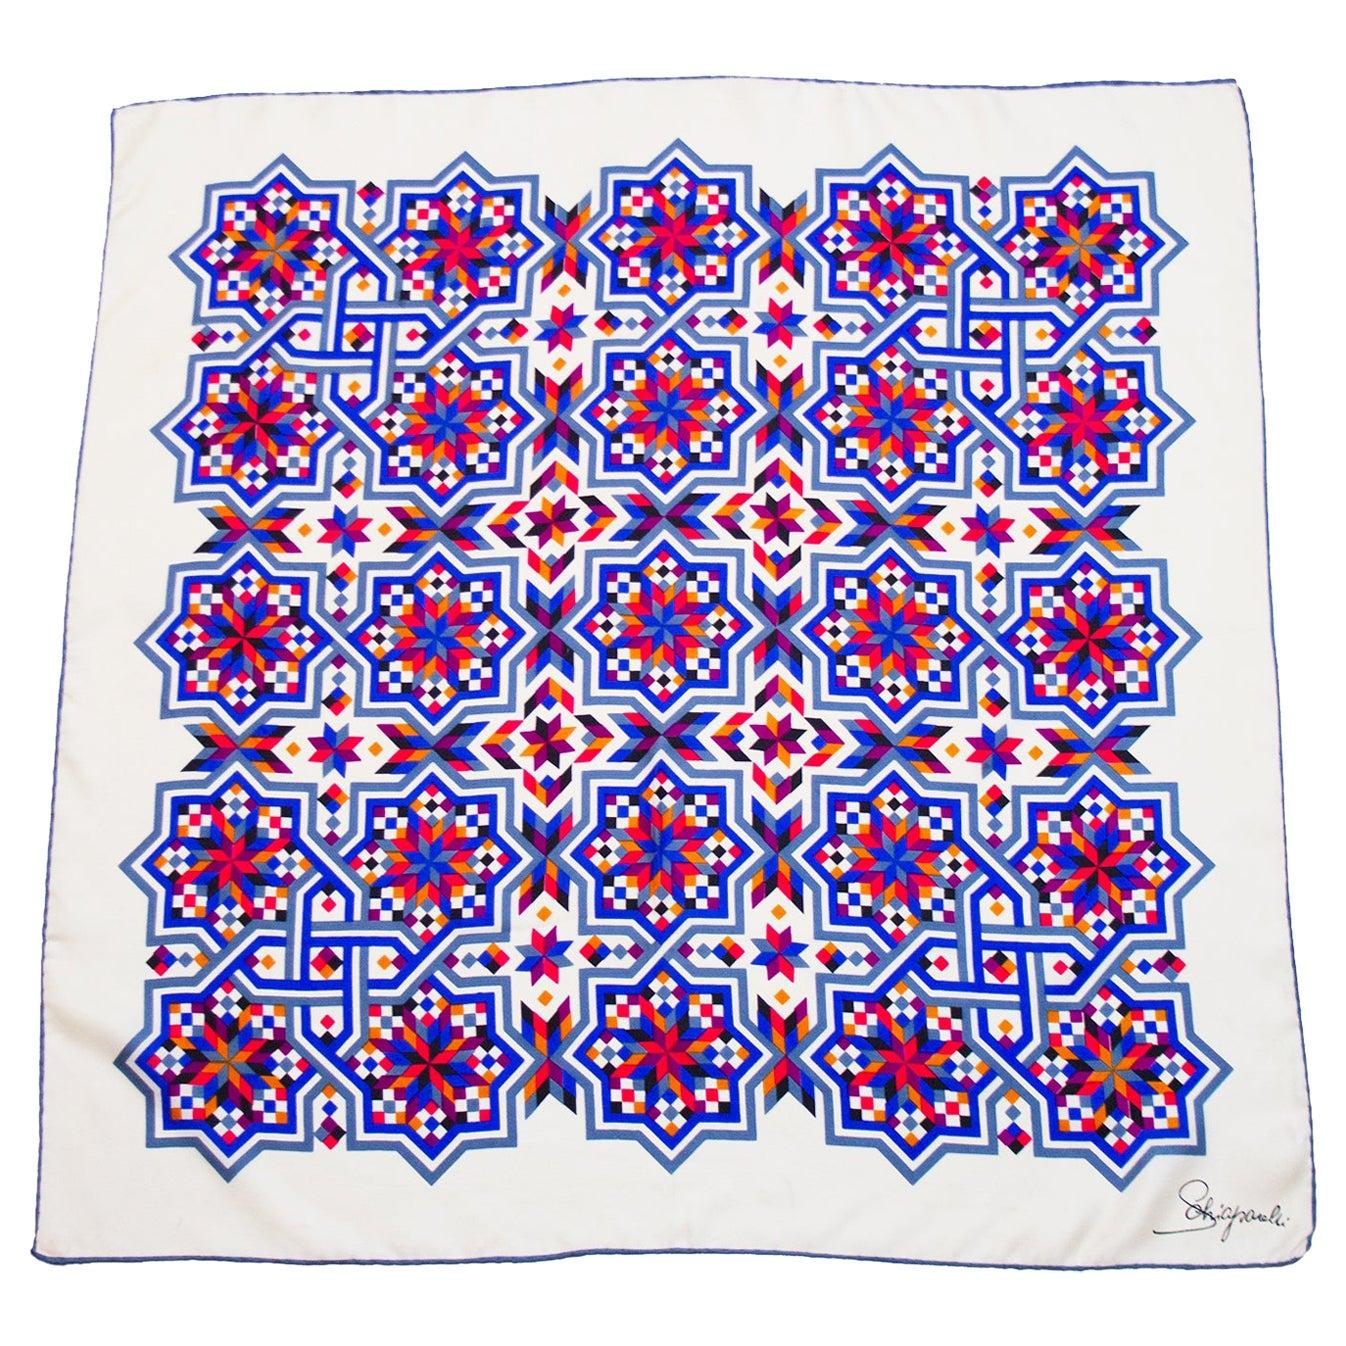 1980s Schiaparelli Geometric Star Print Silk Scarf